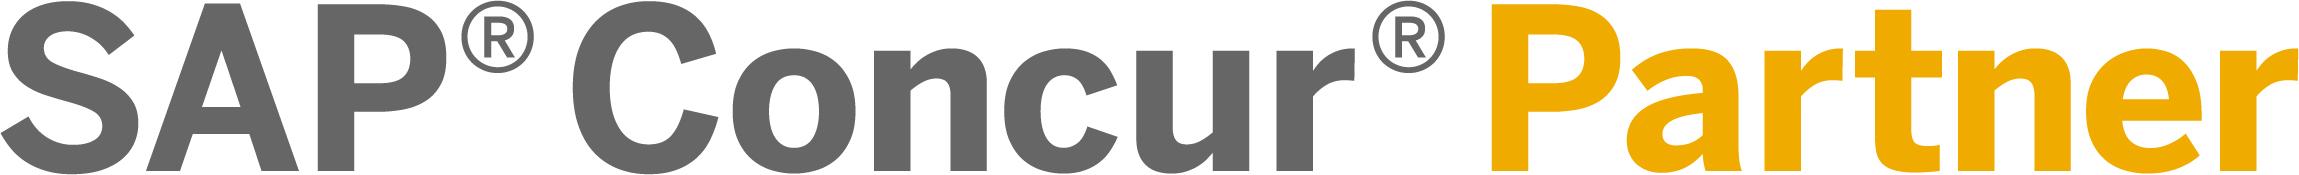 SAP_Concur_Partner_R (1)